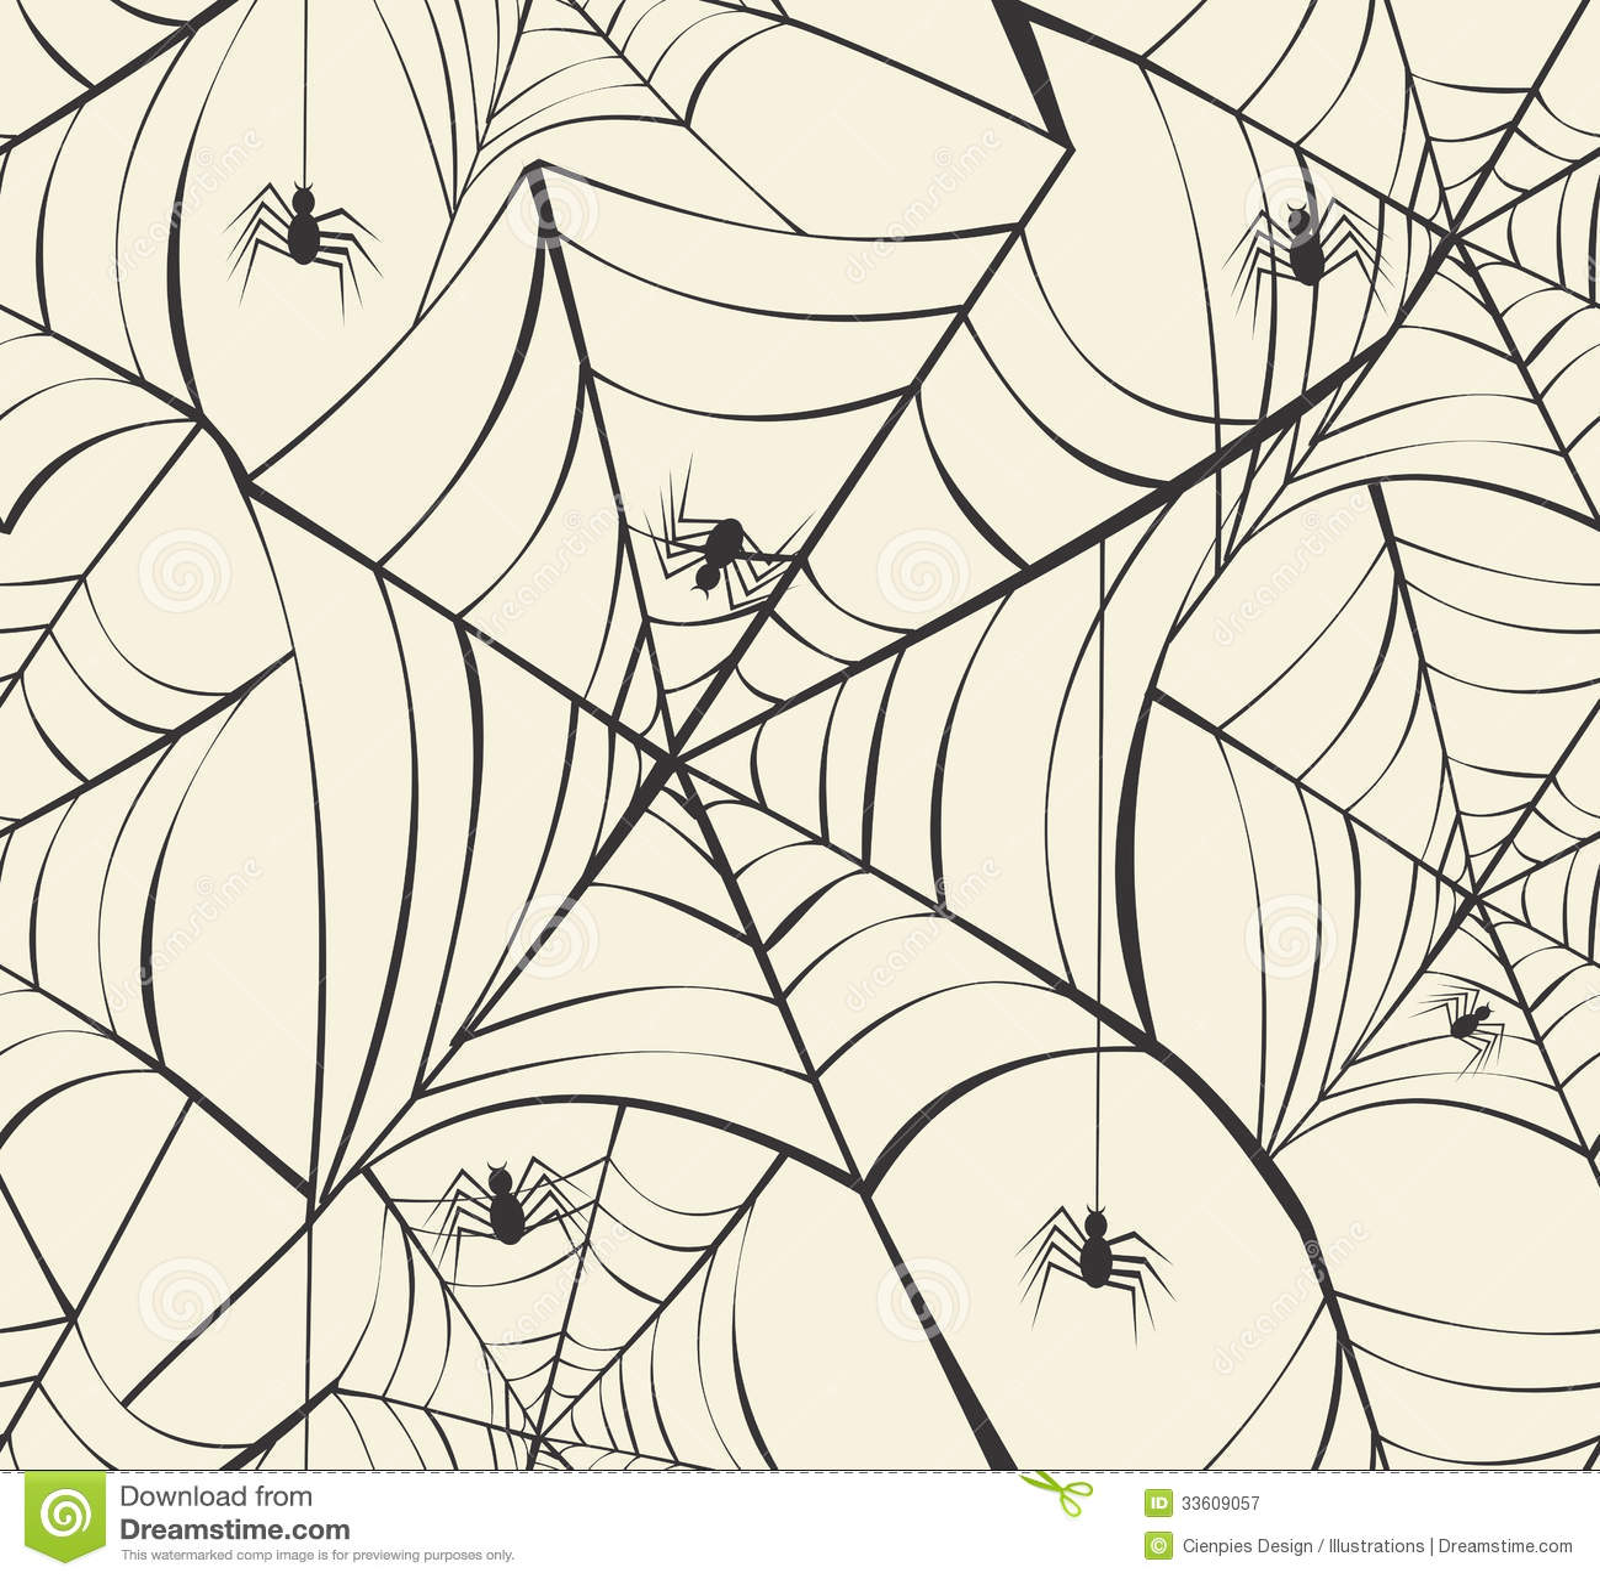 Happy Halloween spider webs seamless pattern background EPS10 fi